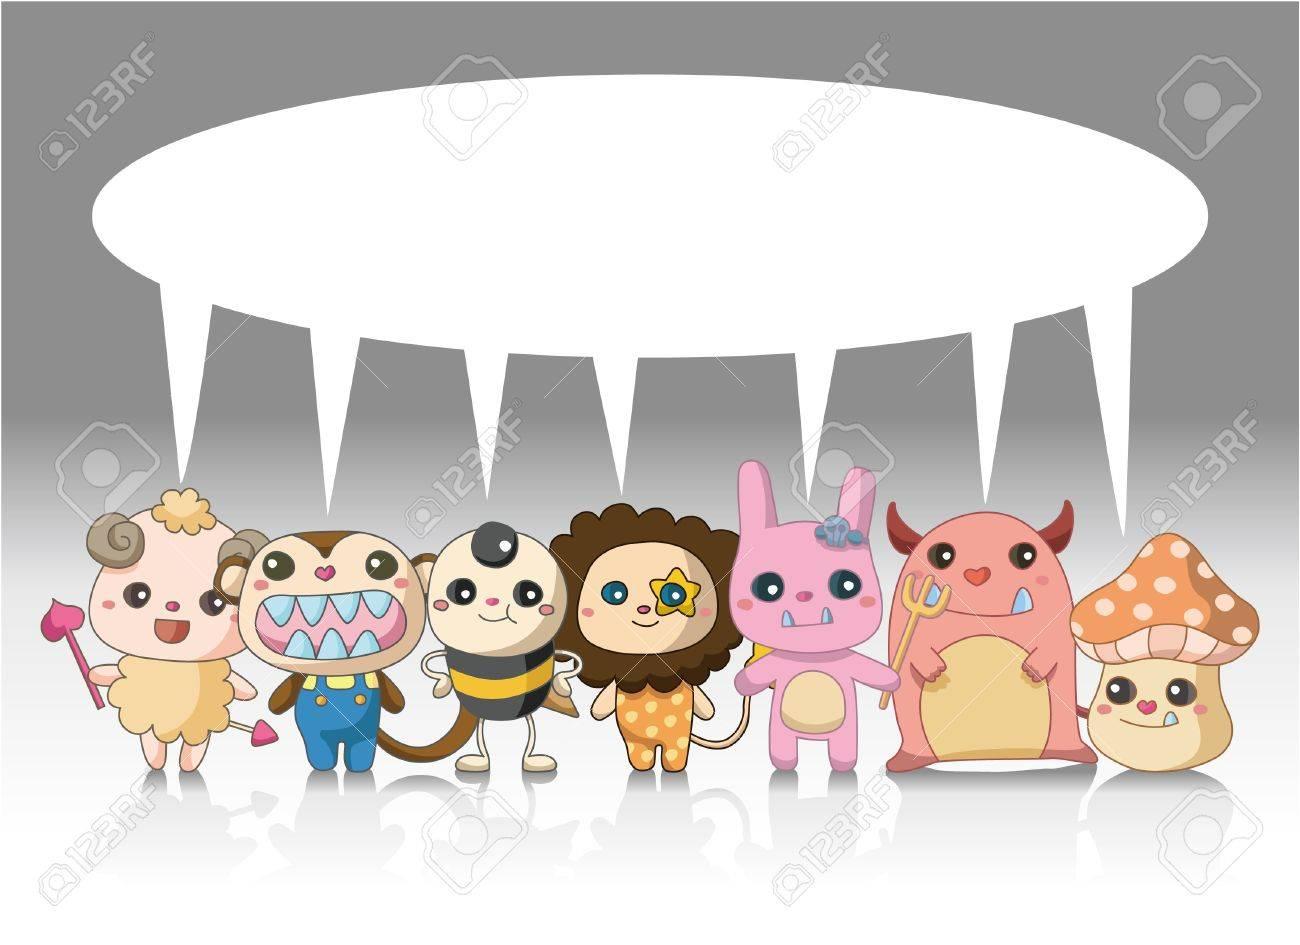 Cartoon Monster Animal Card Royalty Free Cliparts, Vectors, And ...